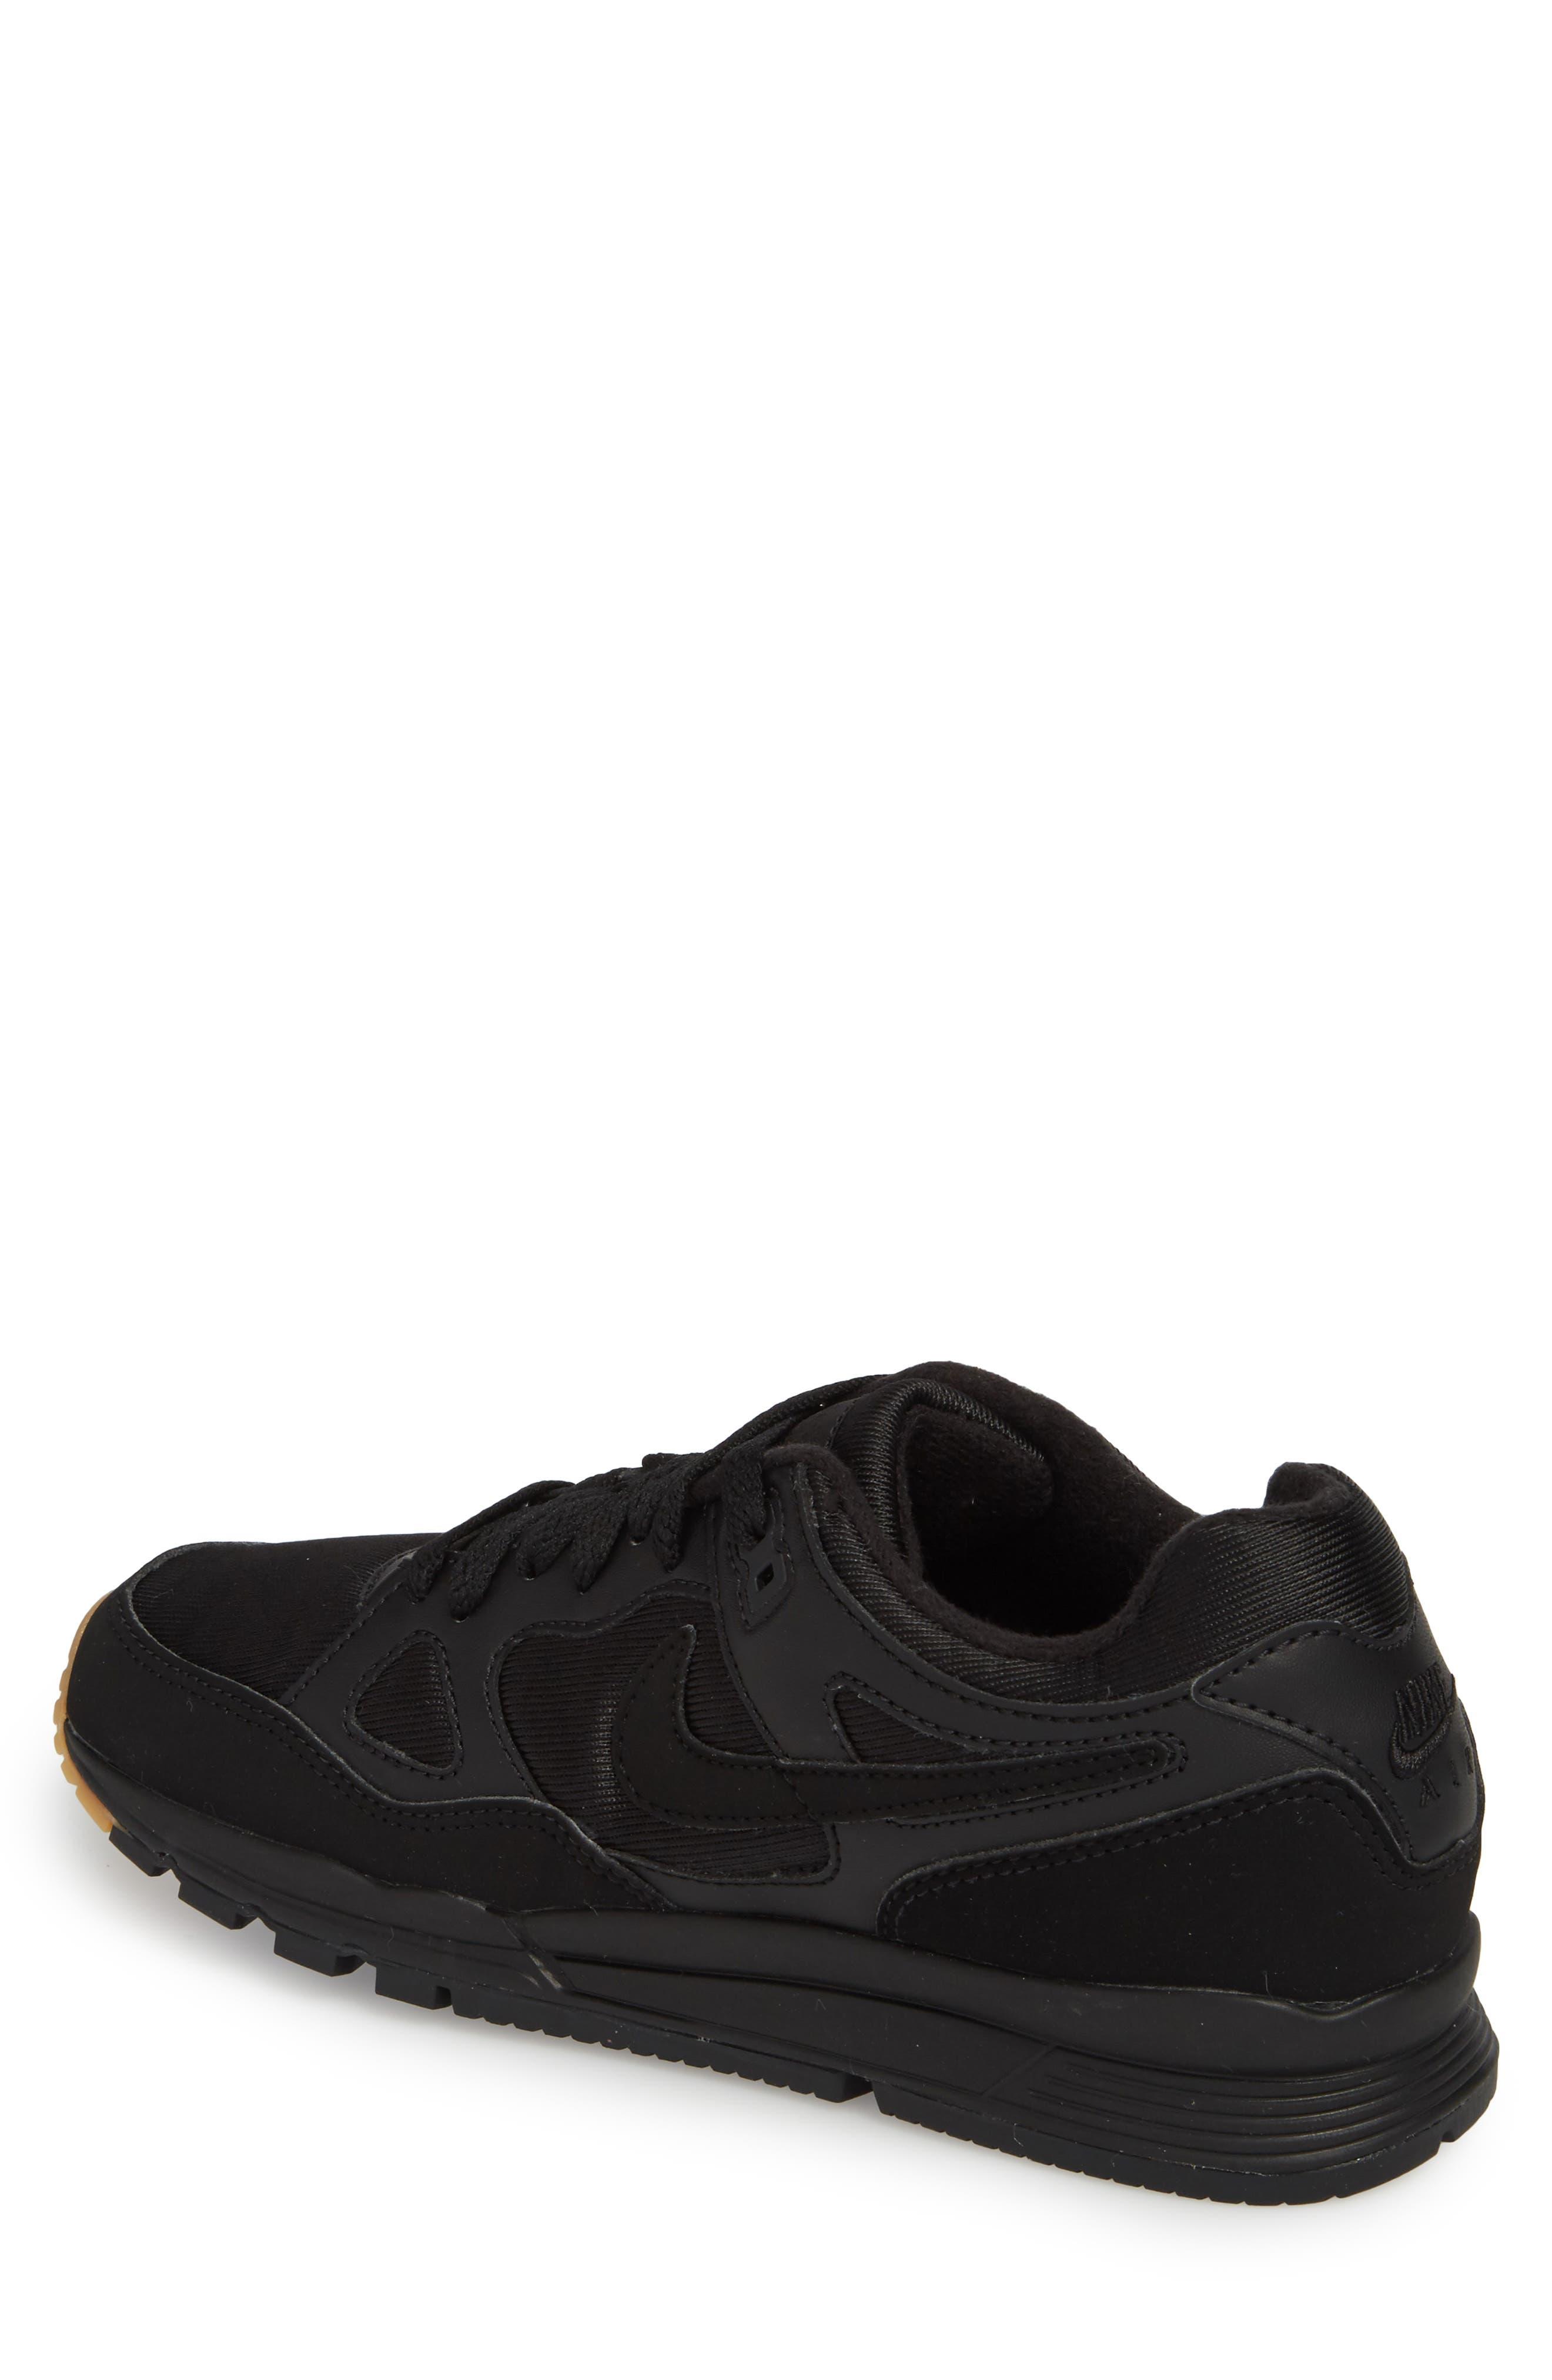 Air Span II Sneaker,                             Alternate thumbnail 2, color,                             BLACK/ BLACK/ BLACK